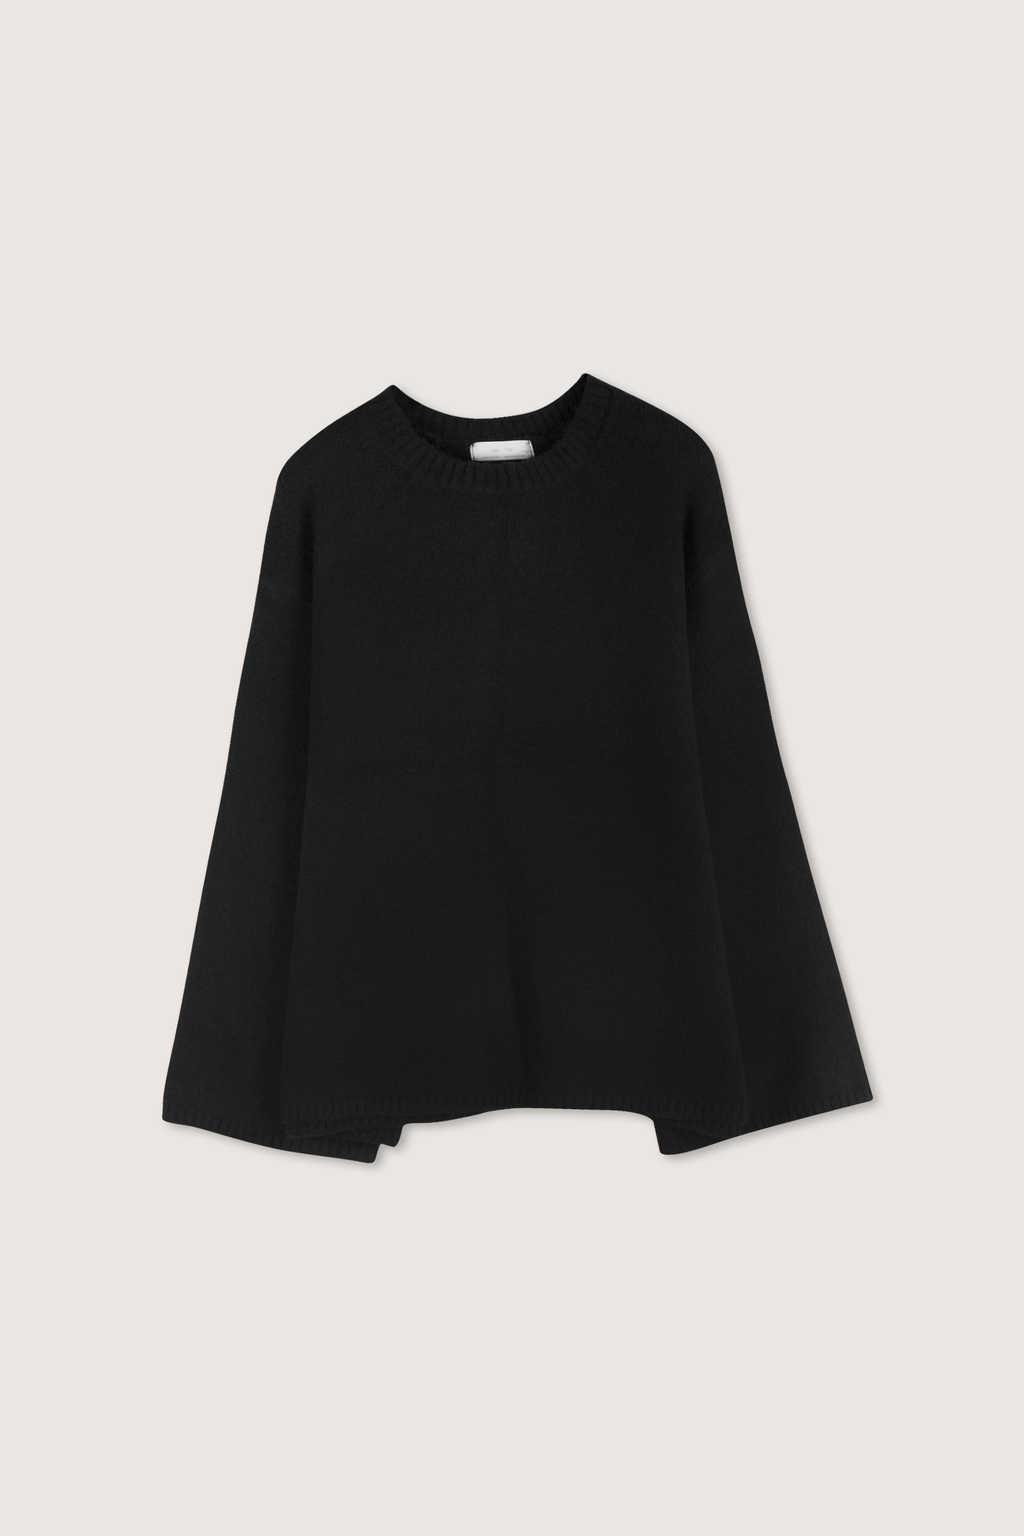 Sweater 1966 Black 8